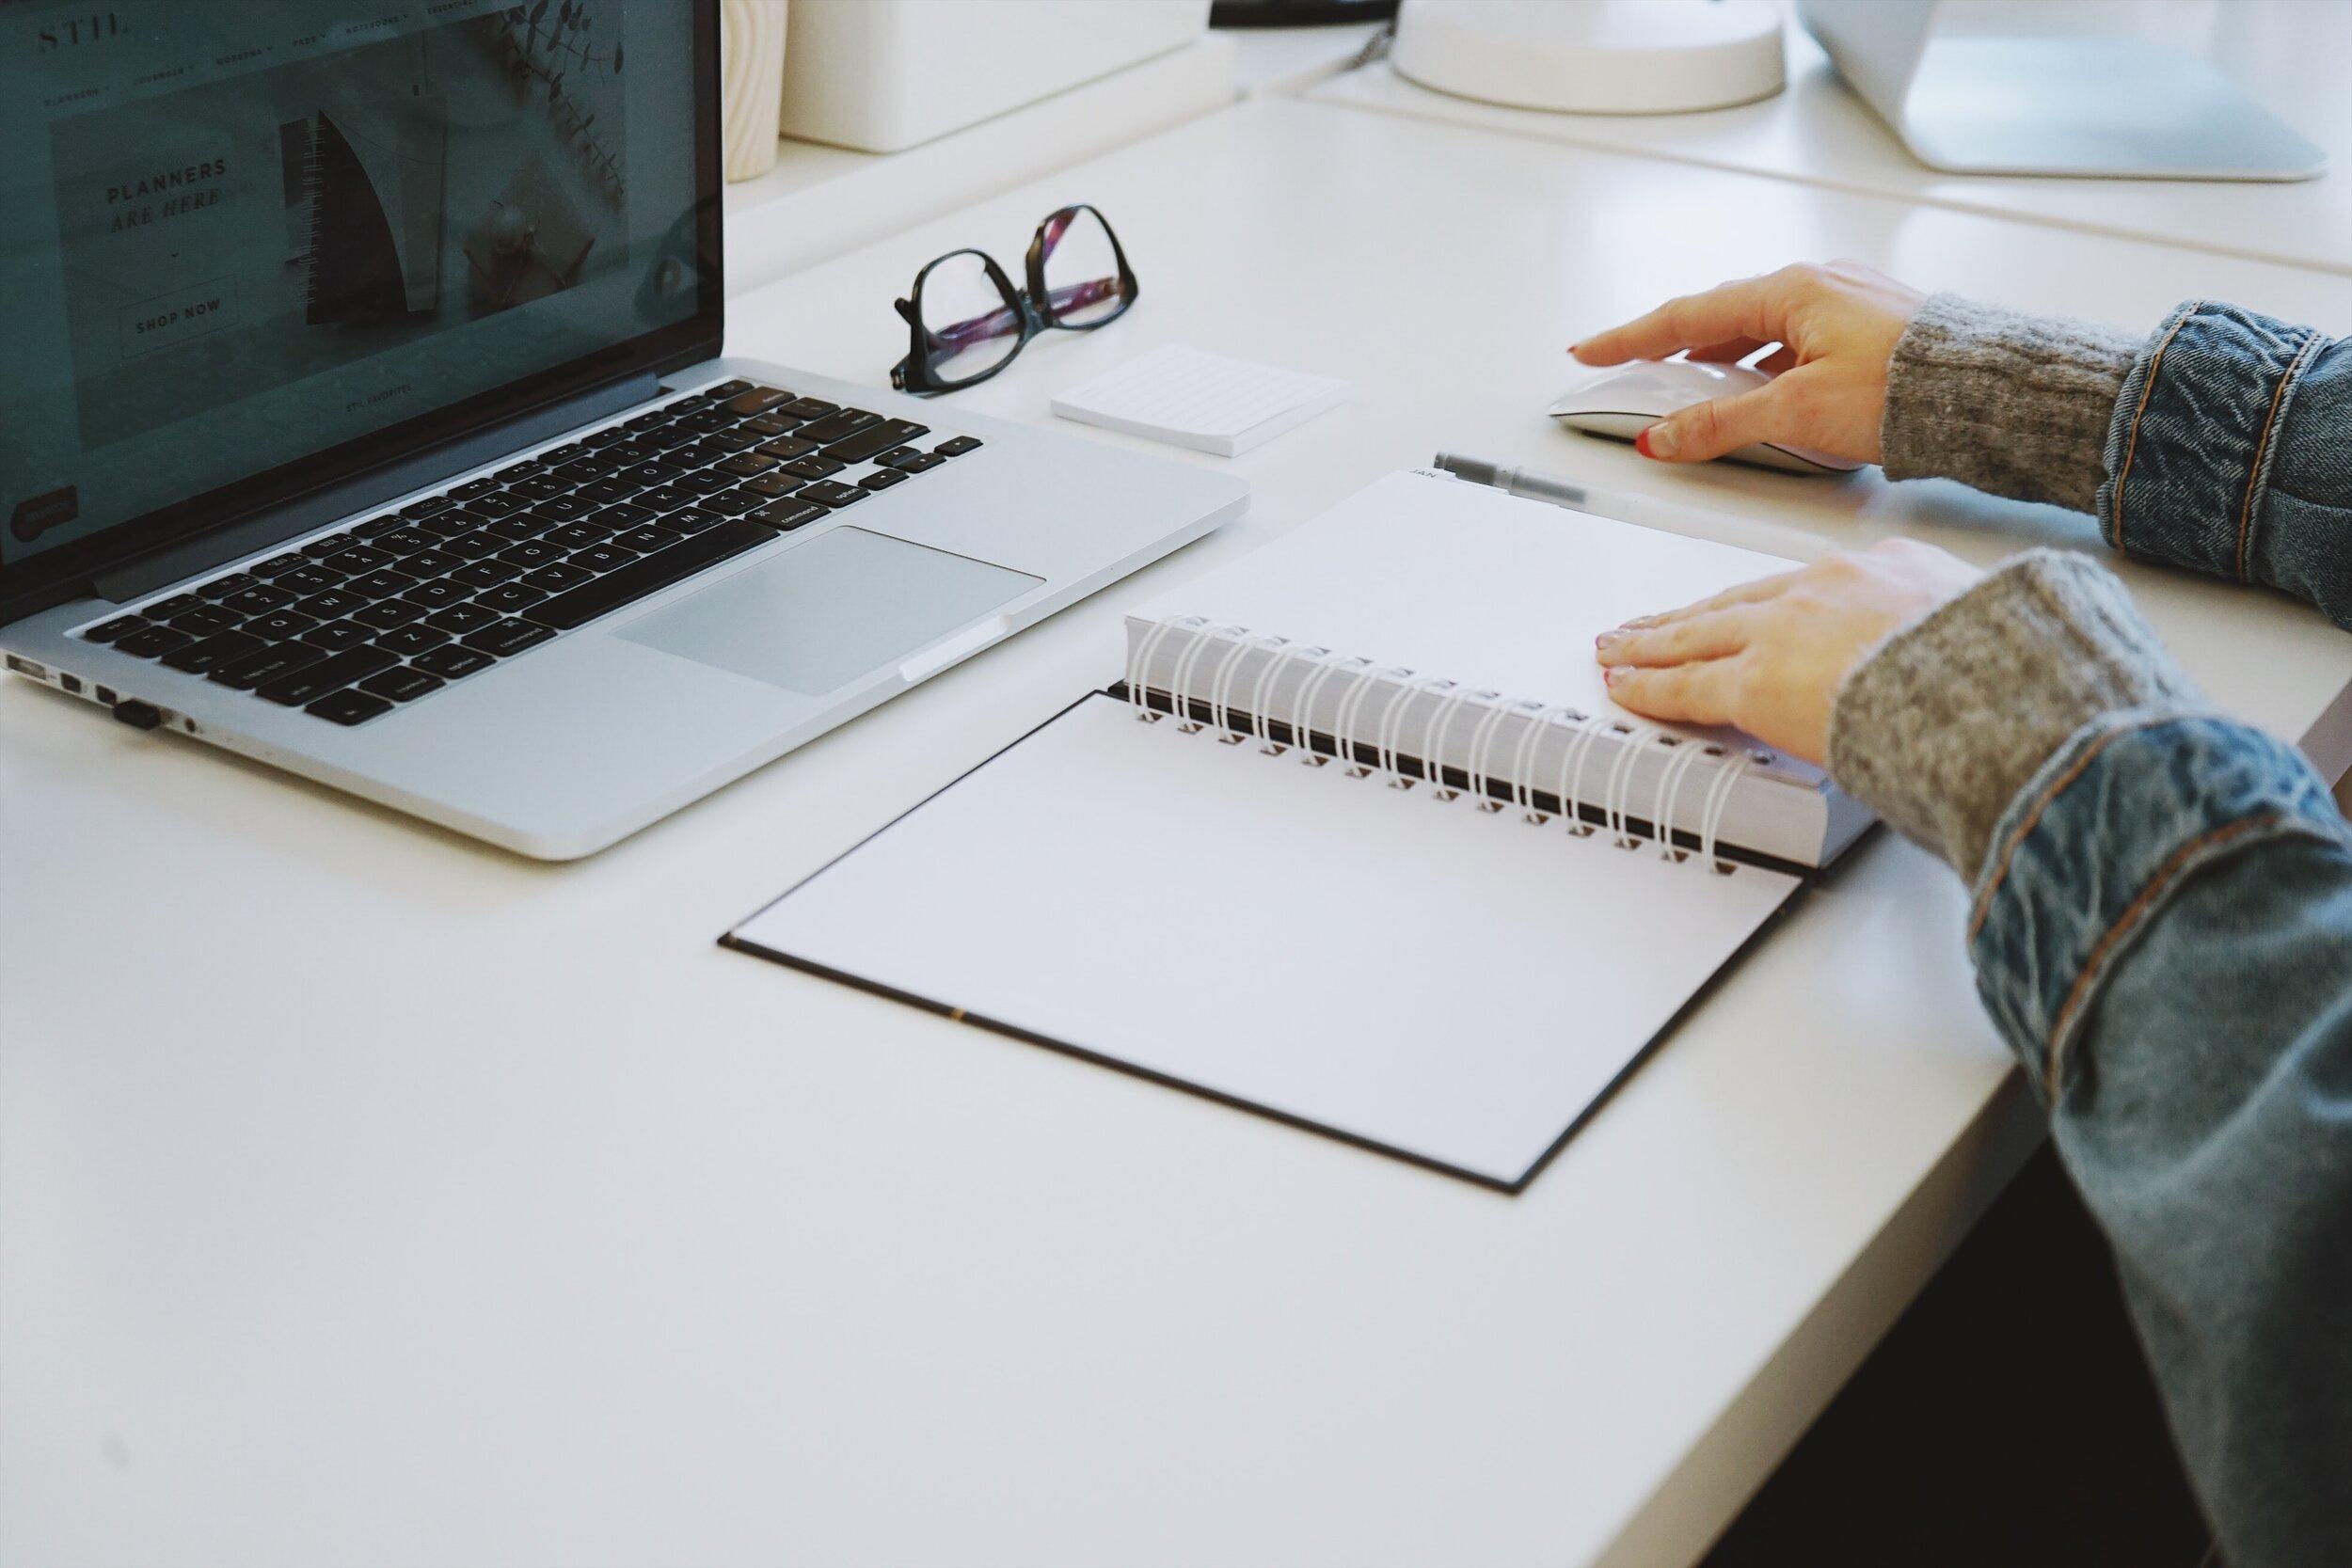 Examples of Work - Responsive Web DesignDesign LibrariesMobile App DesignOmni-channel Product DesignEnterprise SoftwareBusiness Intelligence Dashboards